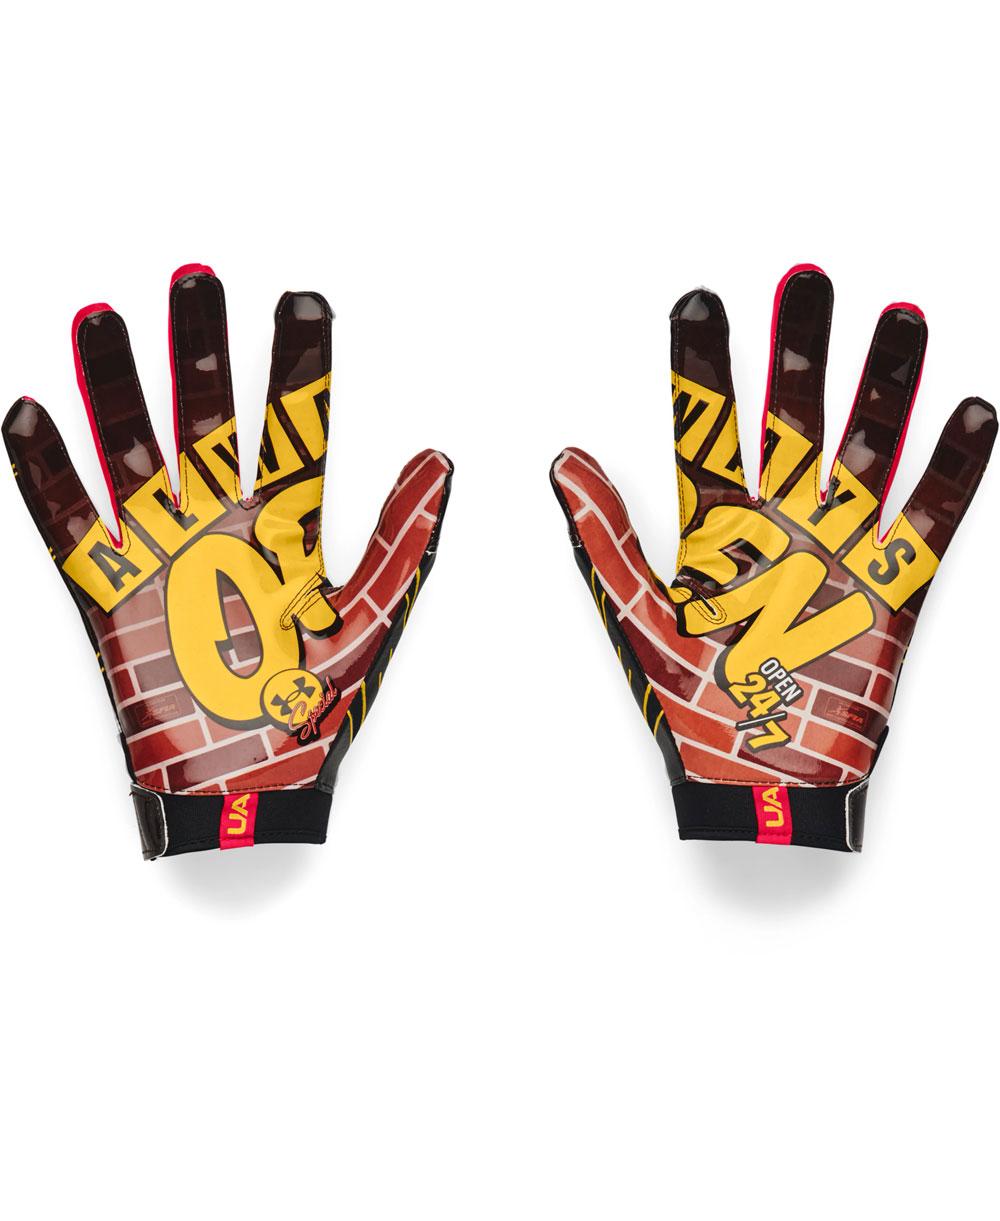 UA F7 Graphic Men's Football Gloves Black/Metallic Silver